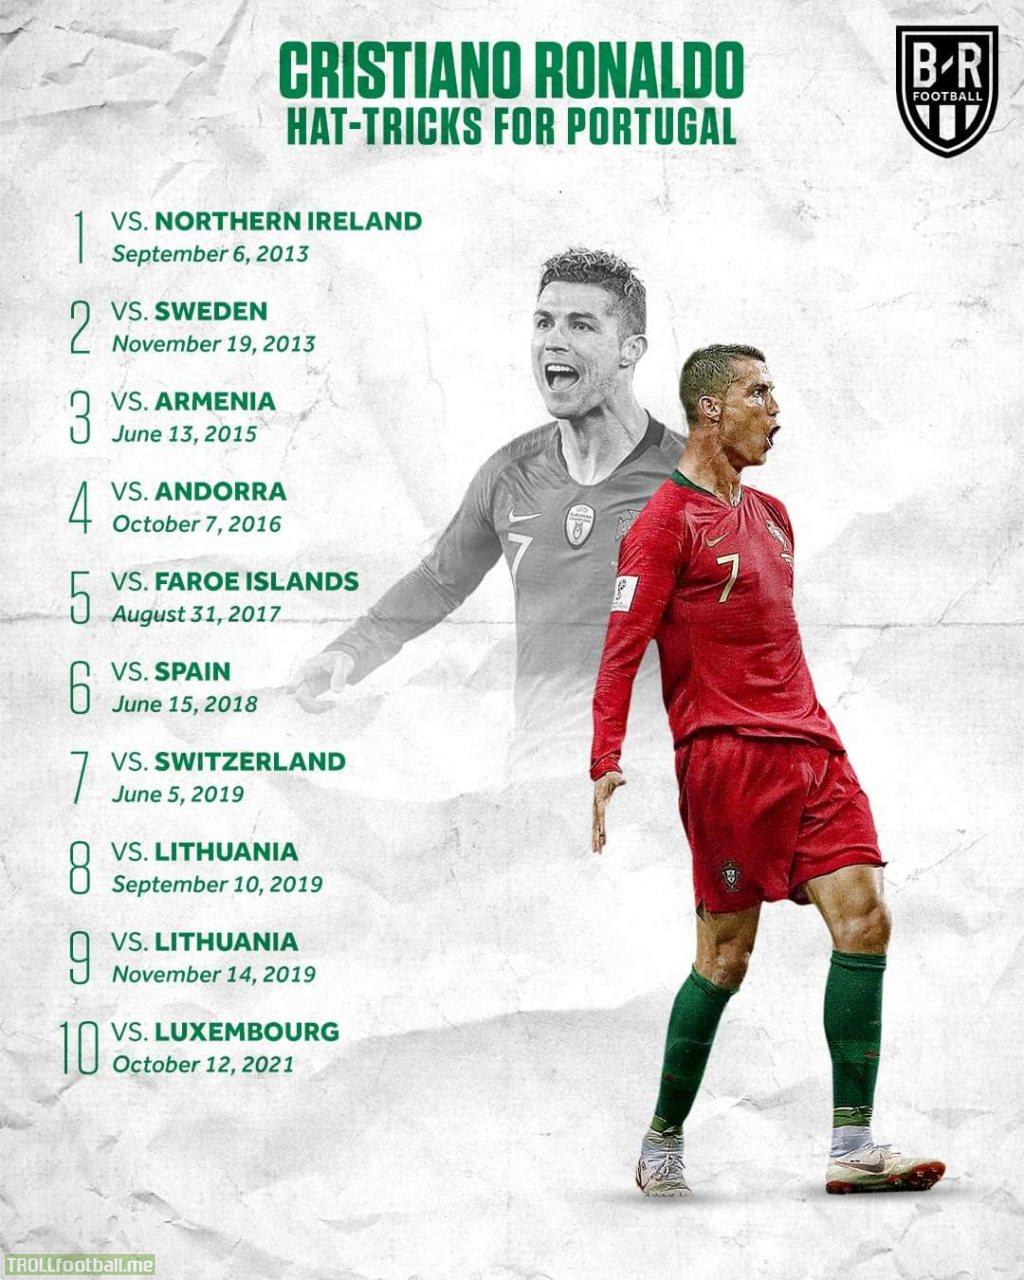 [BR Football] Cristiano Ronaldo's hat-tricks for Portugal